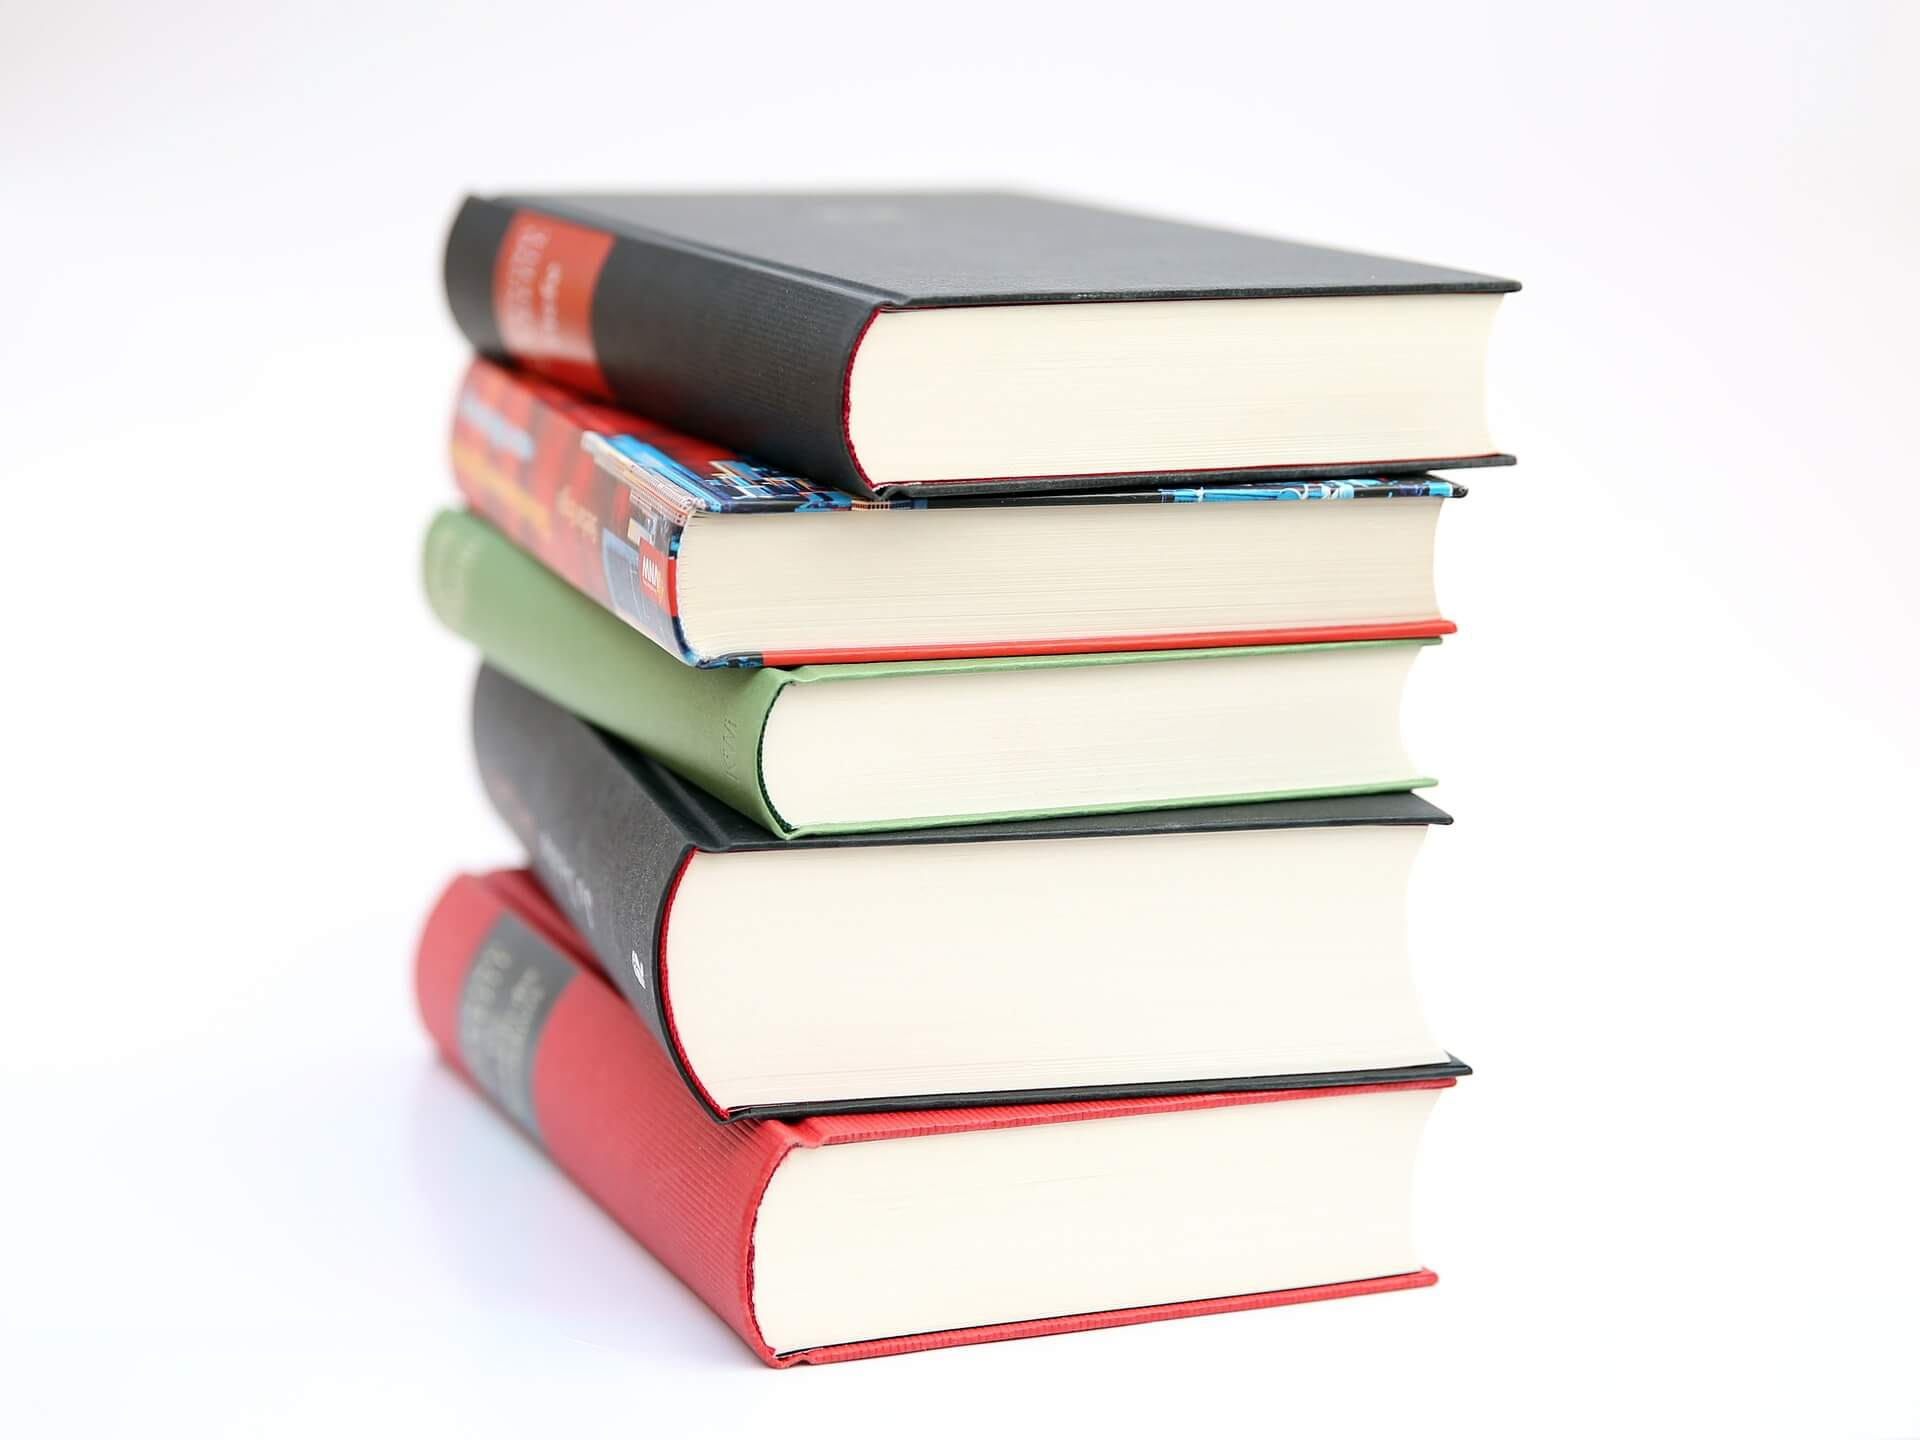 Immobilien Buch Empfehlung